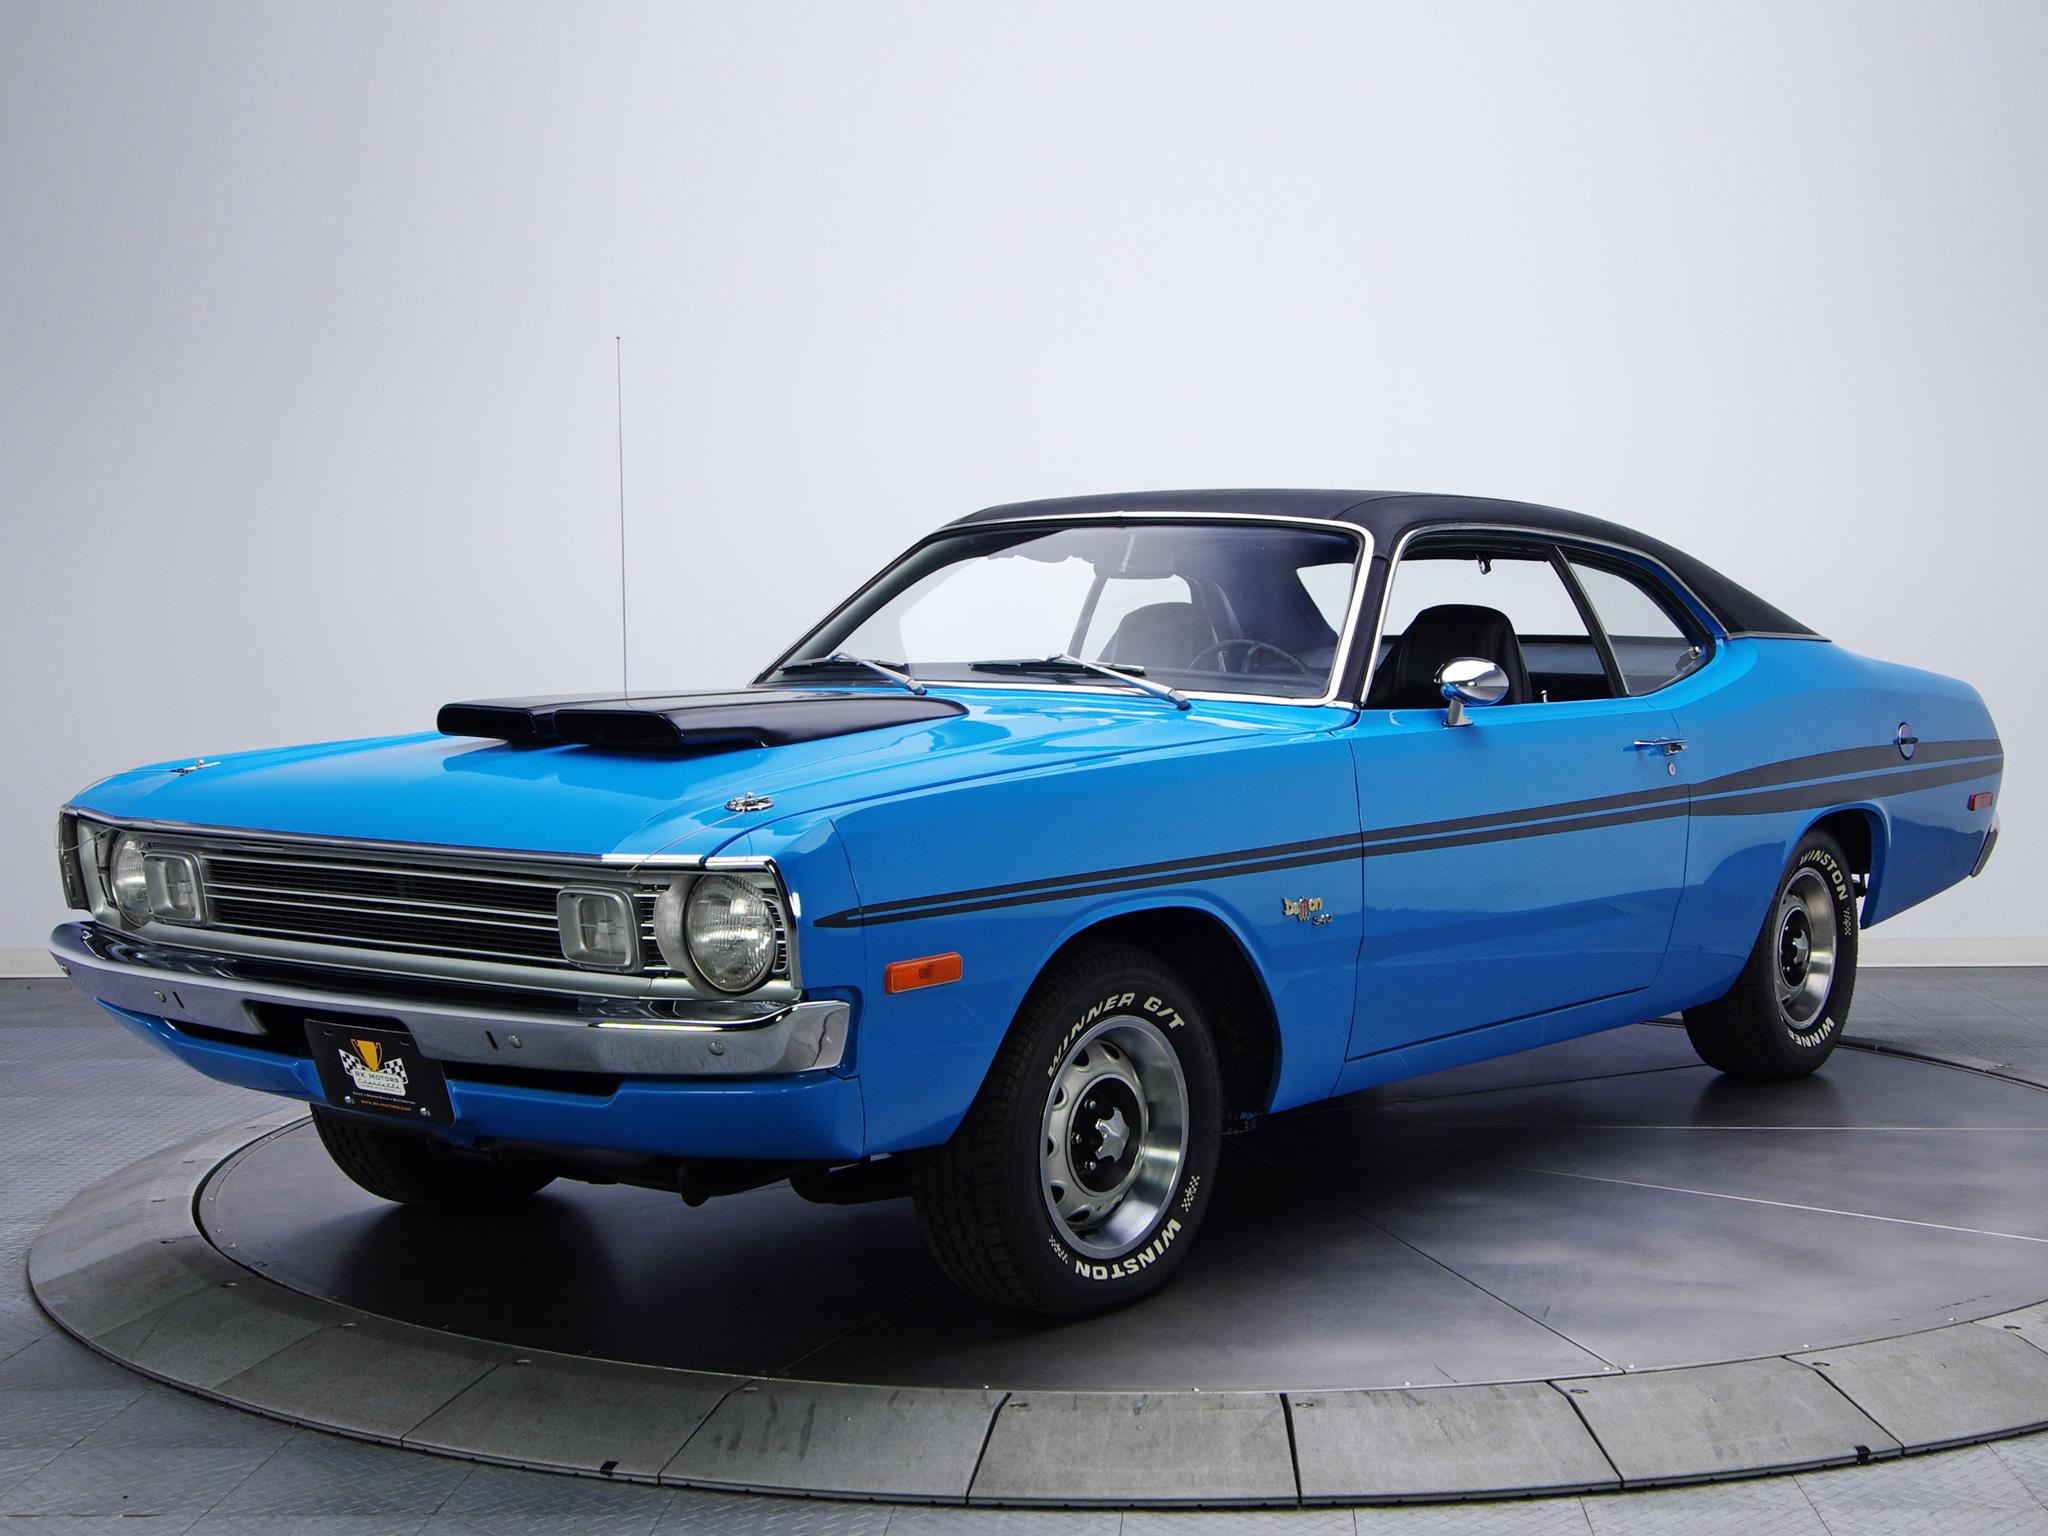 1972 Dodge Dart Demon 340 LM29 Muscle Classic Wallpaper 2048x1536 2048x1536